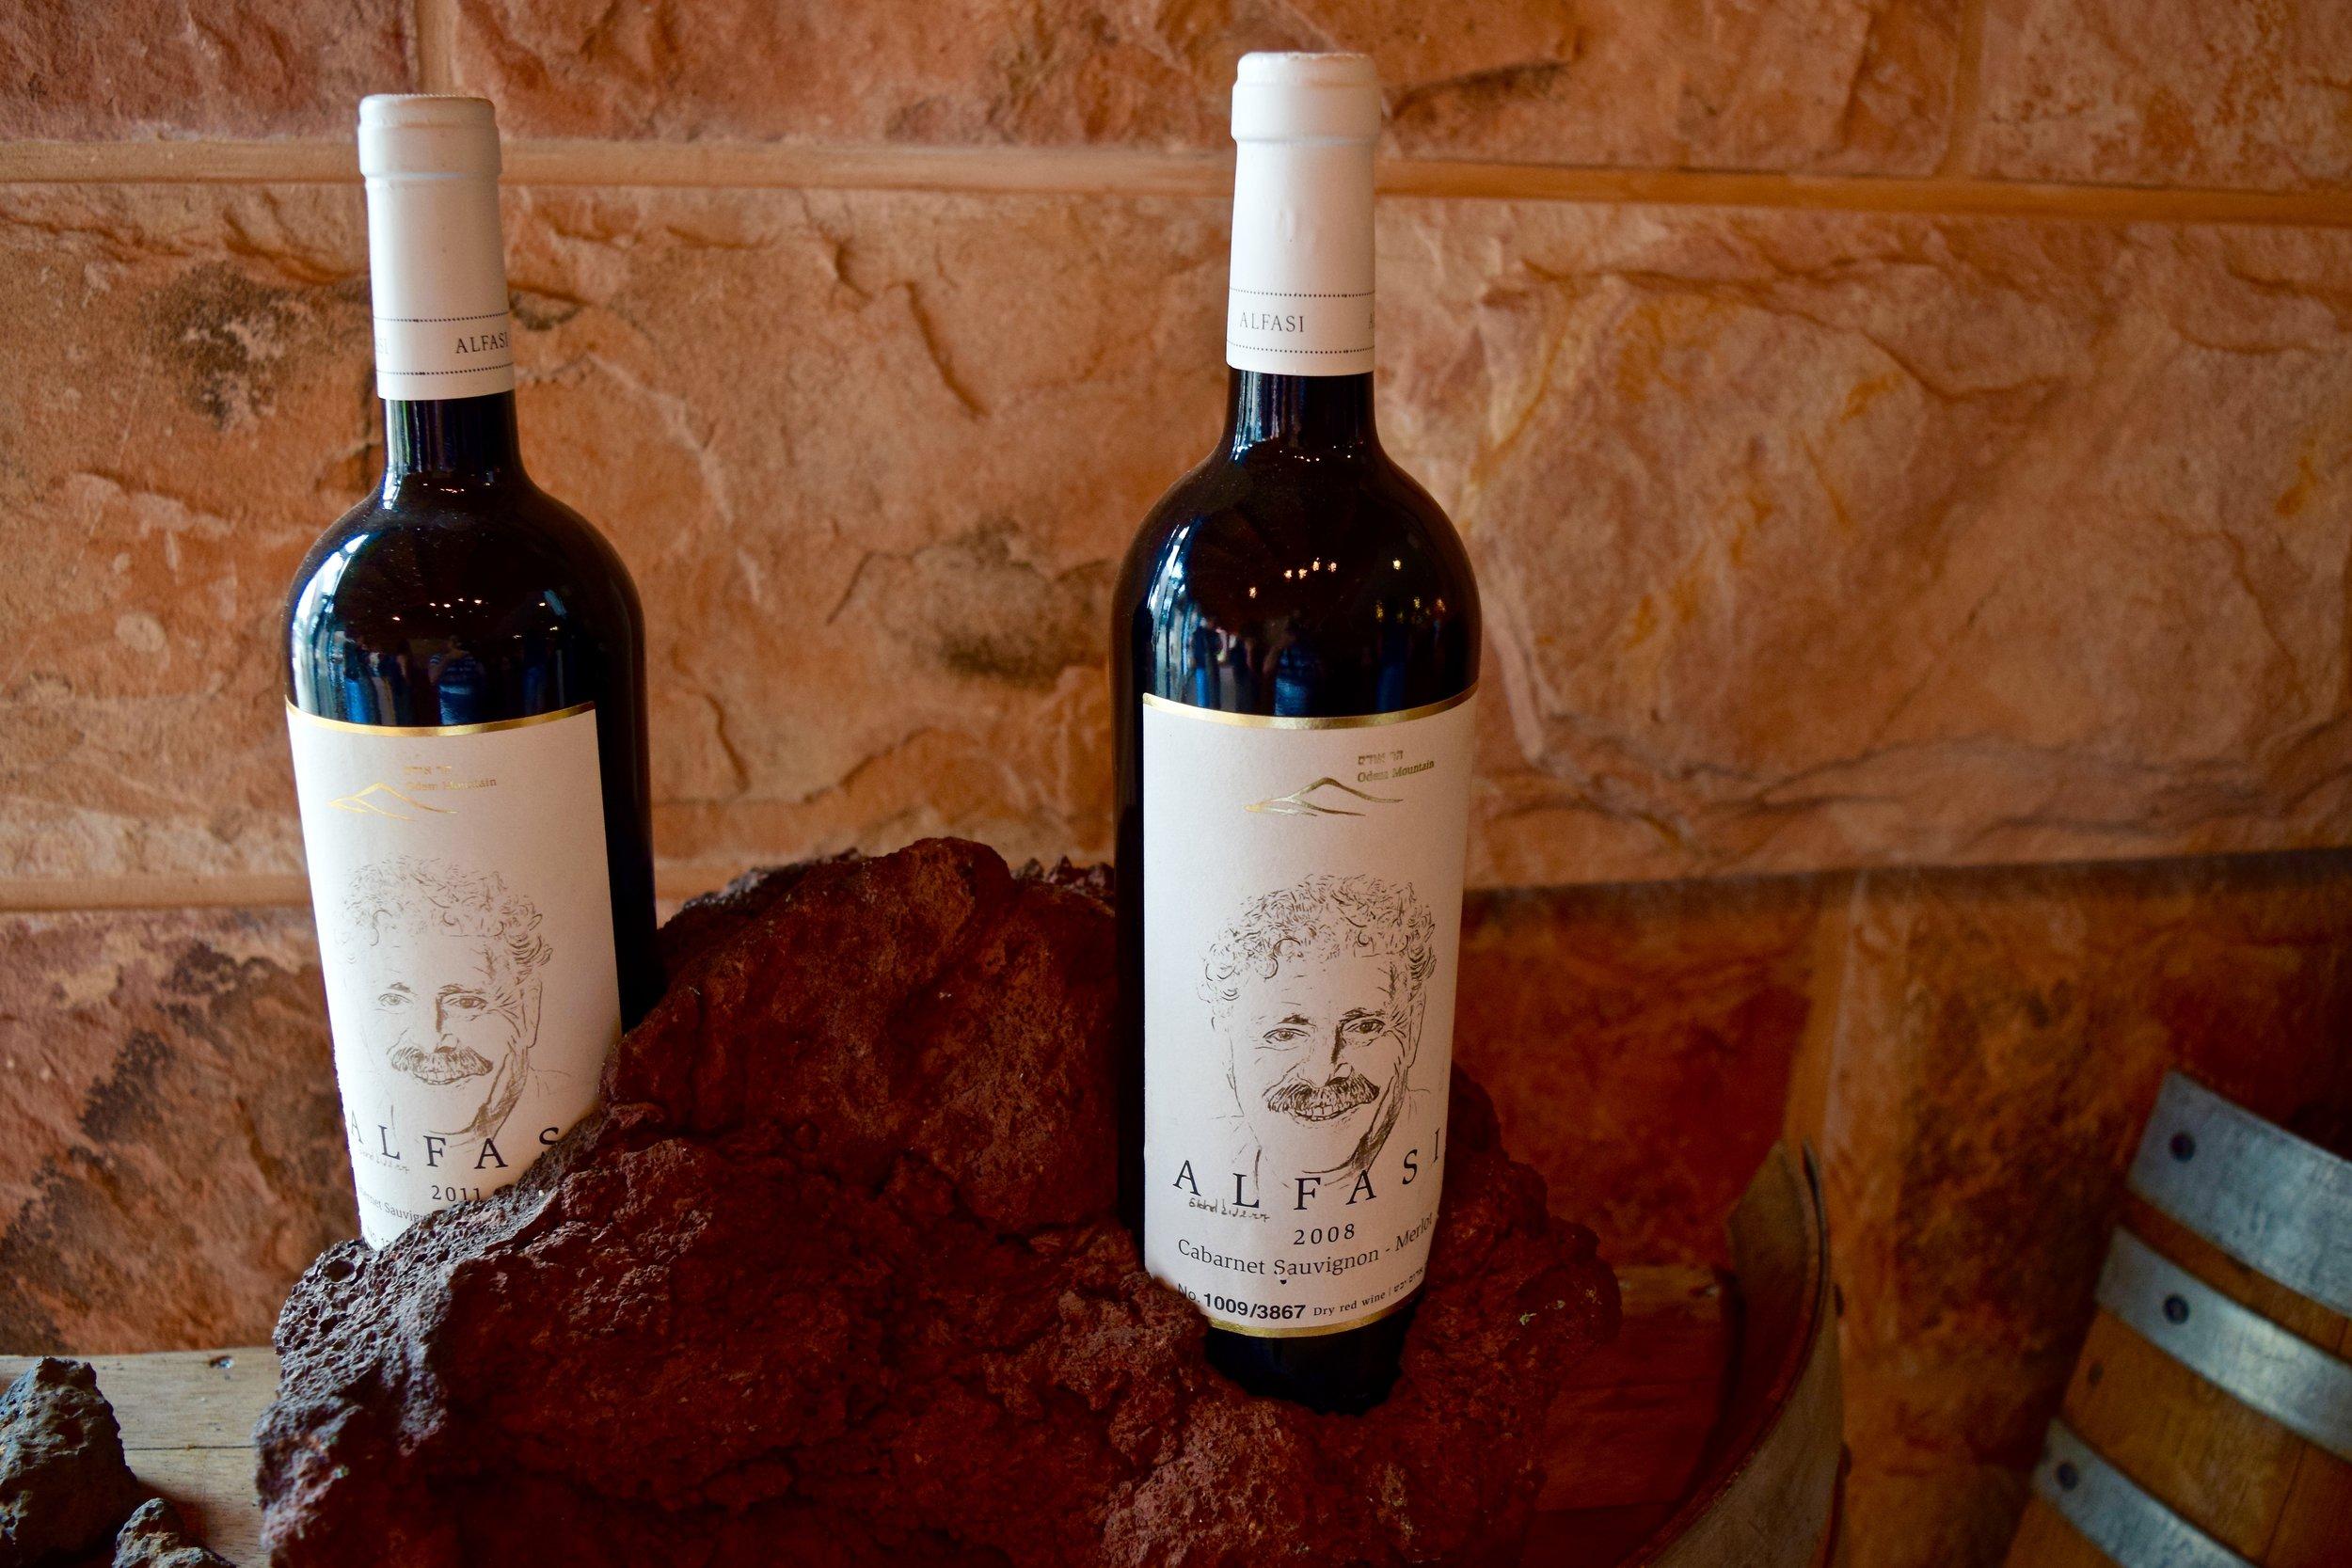 Alfasi Wine